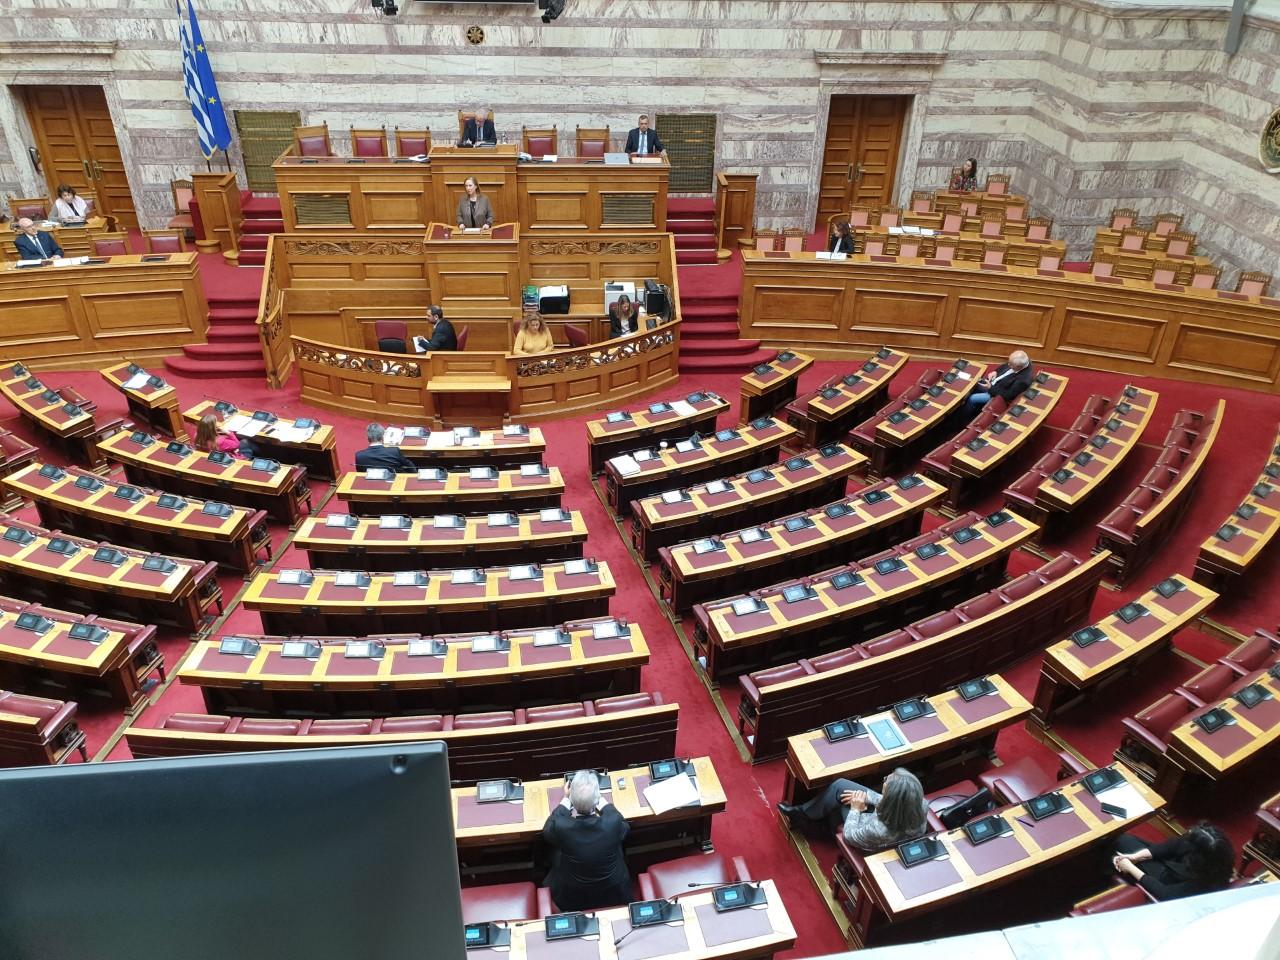 Covid-19: Mέτρα της Βουλής στις συνεδριάσεις